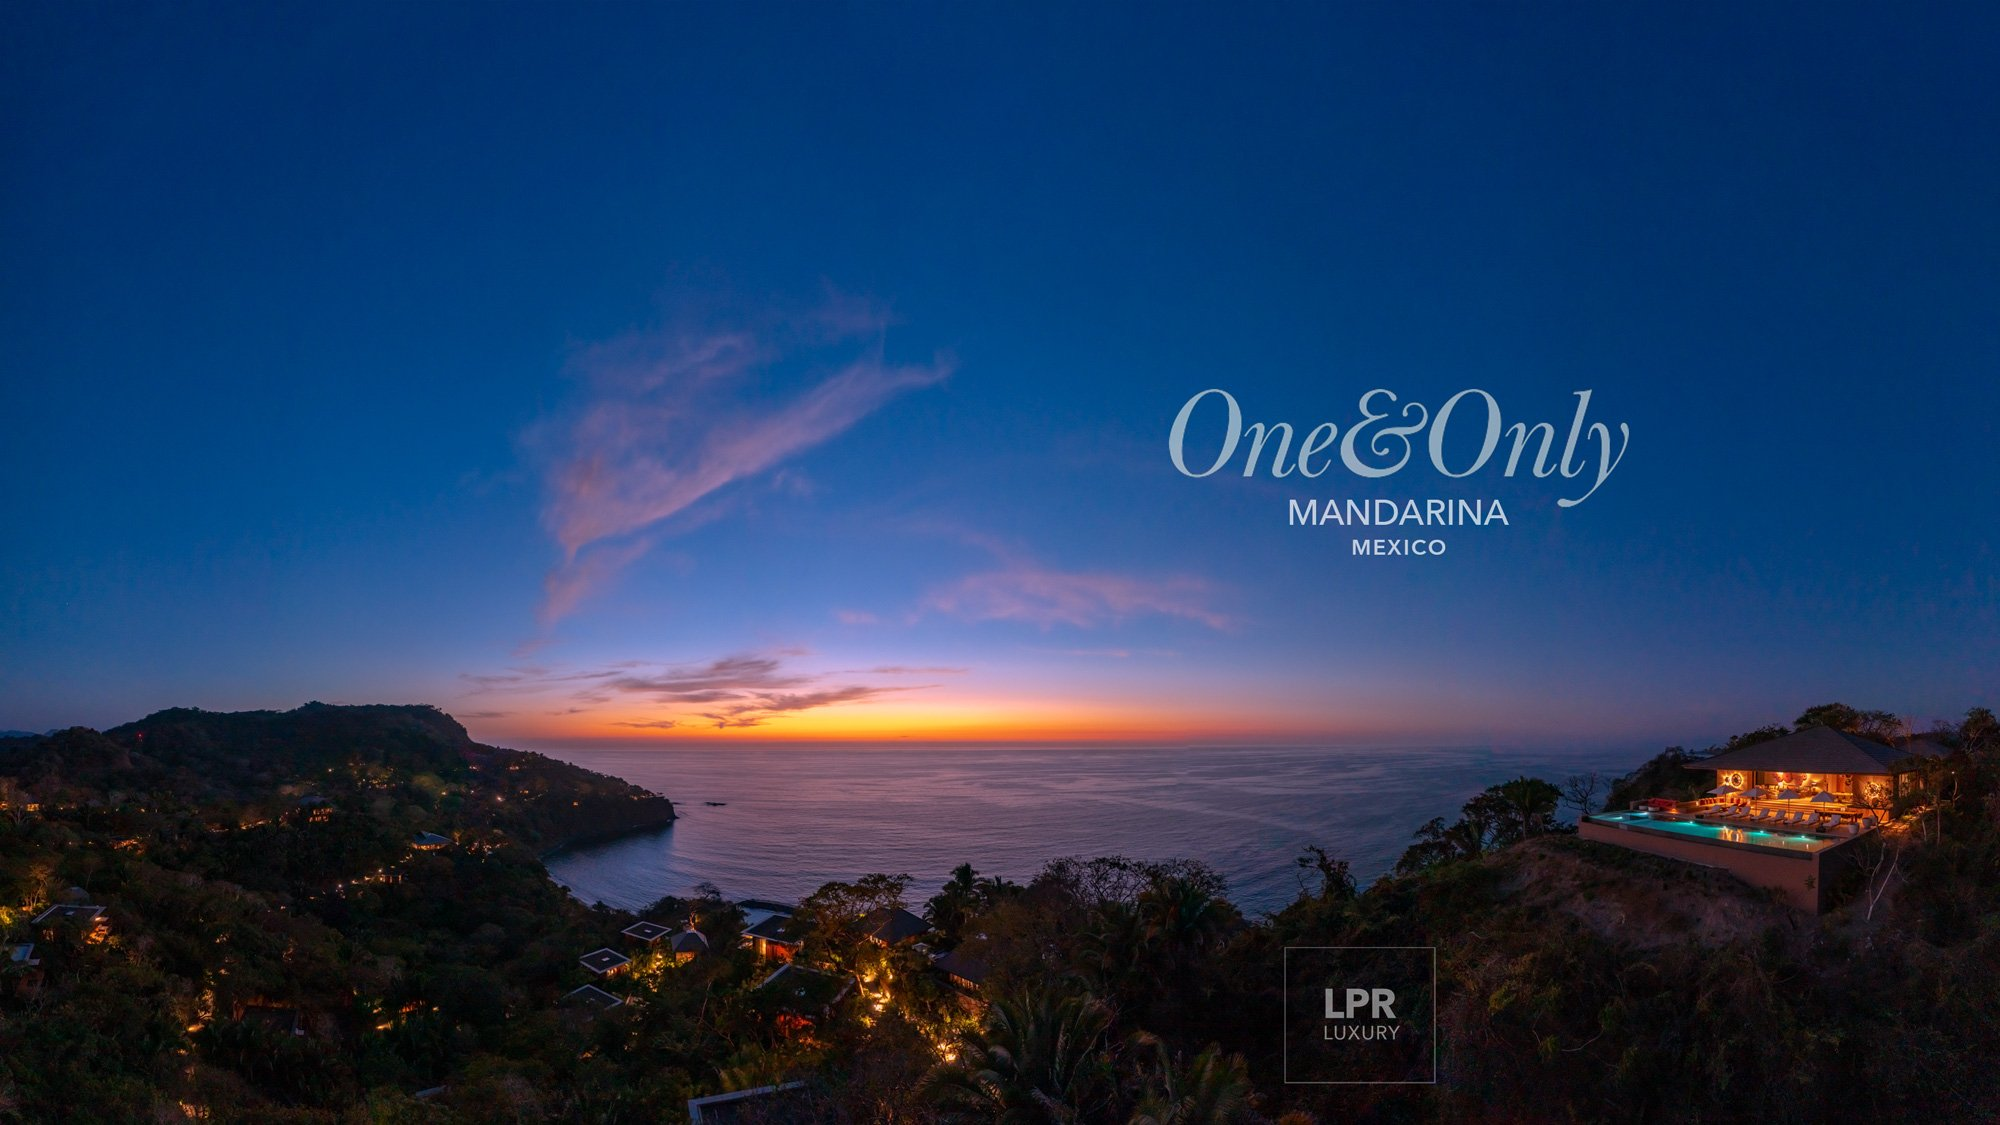 One&Only Mandarina - Riviera Nayarit, Mexico - Resort & Real Estate - Mexico